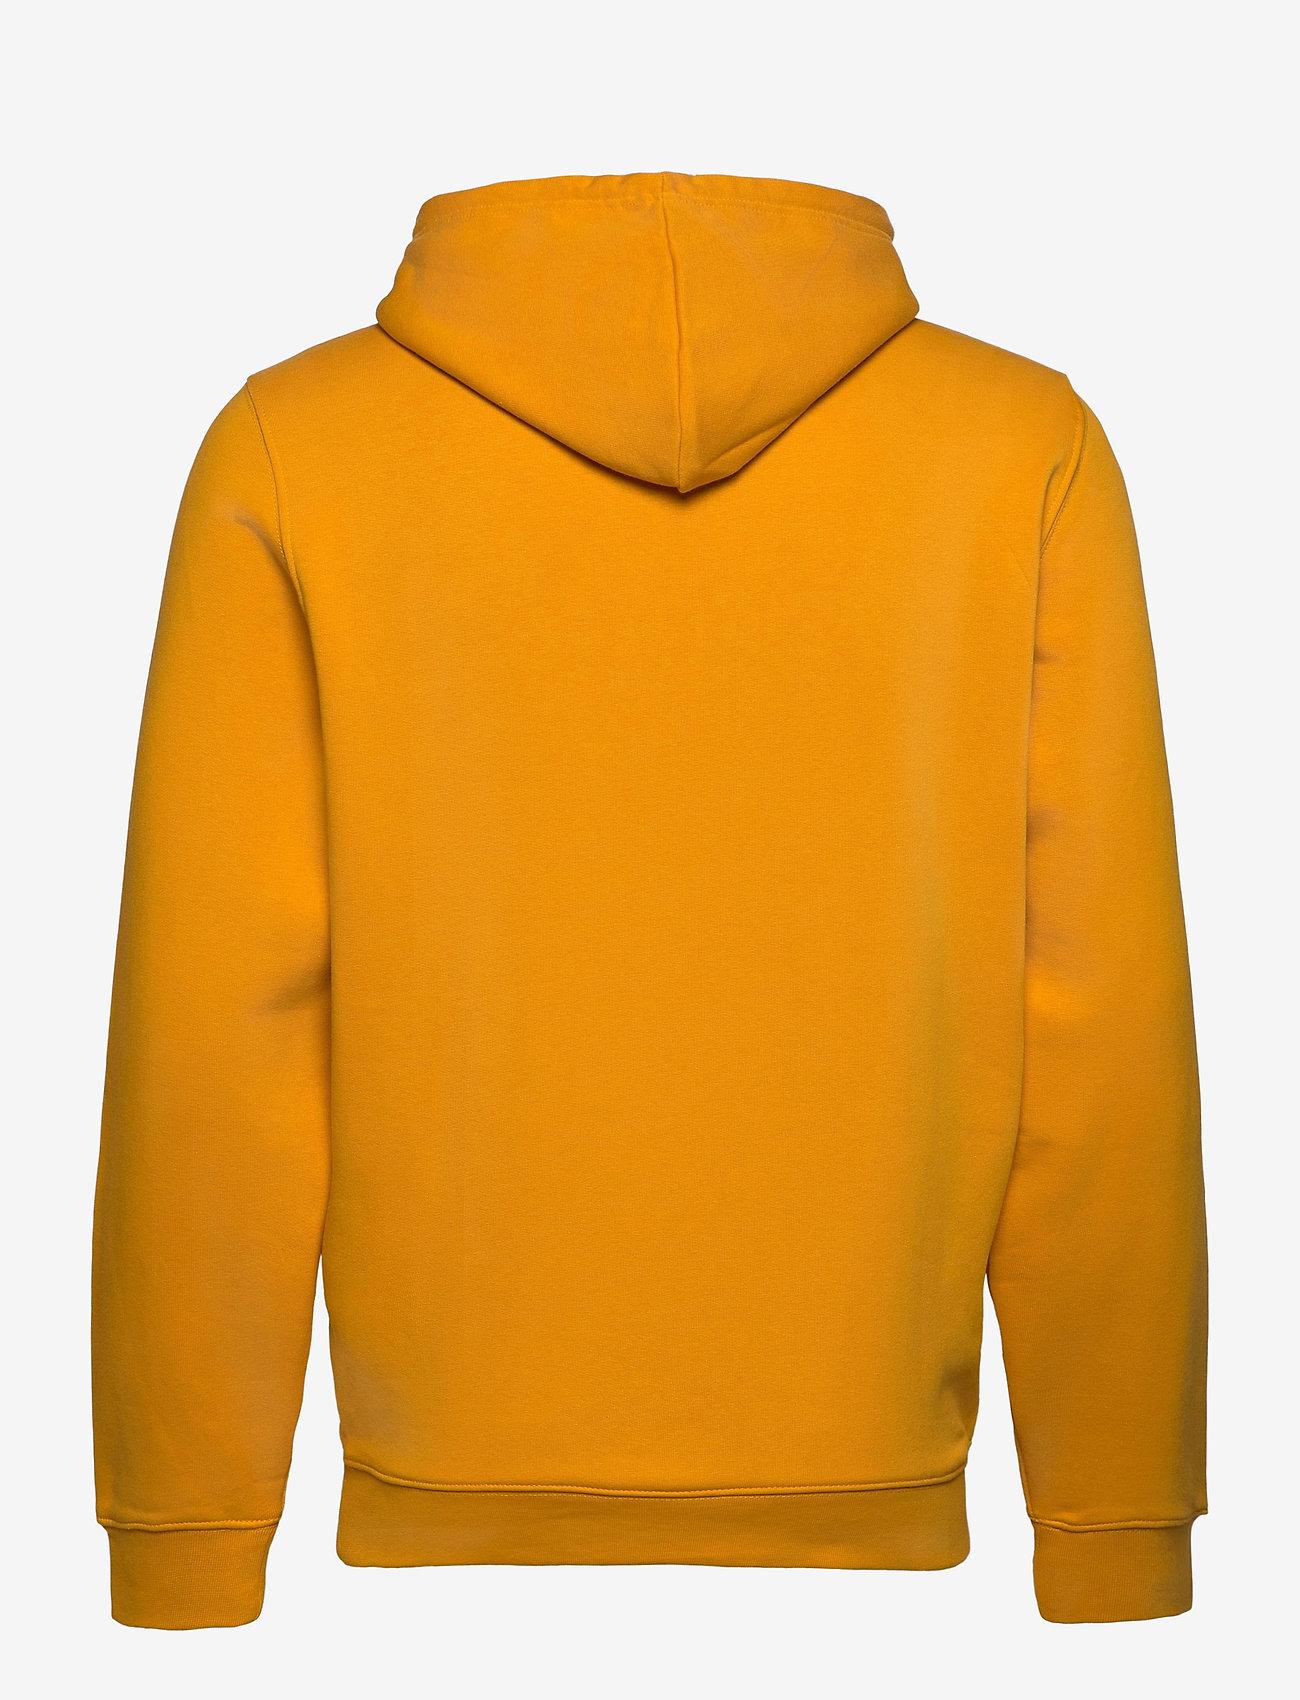 Champion Hooded Sweatshirt - Sweatshirts AUTUMN BLAZE - Menn Klær